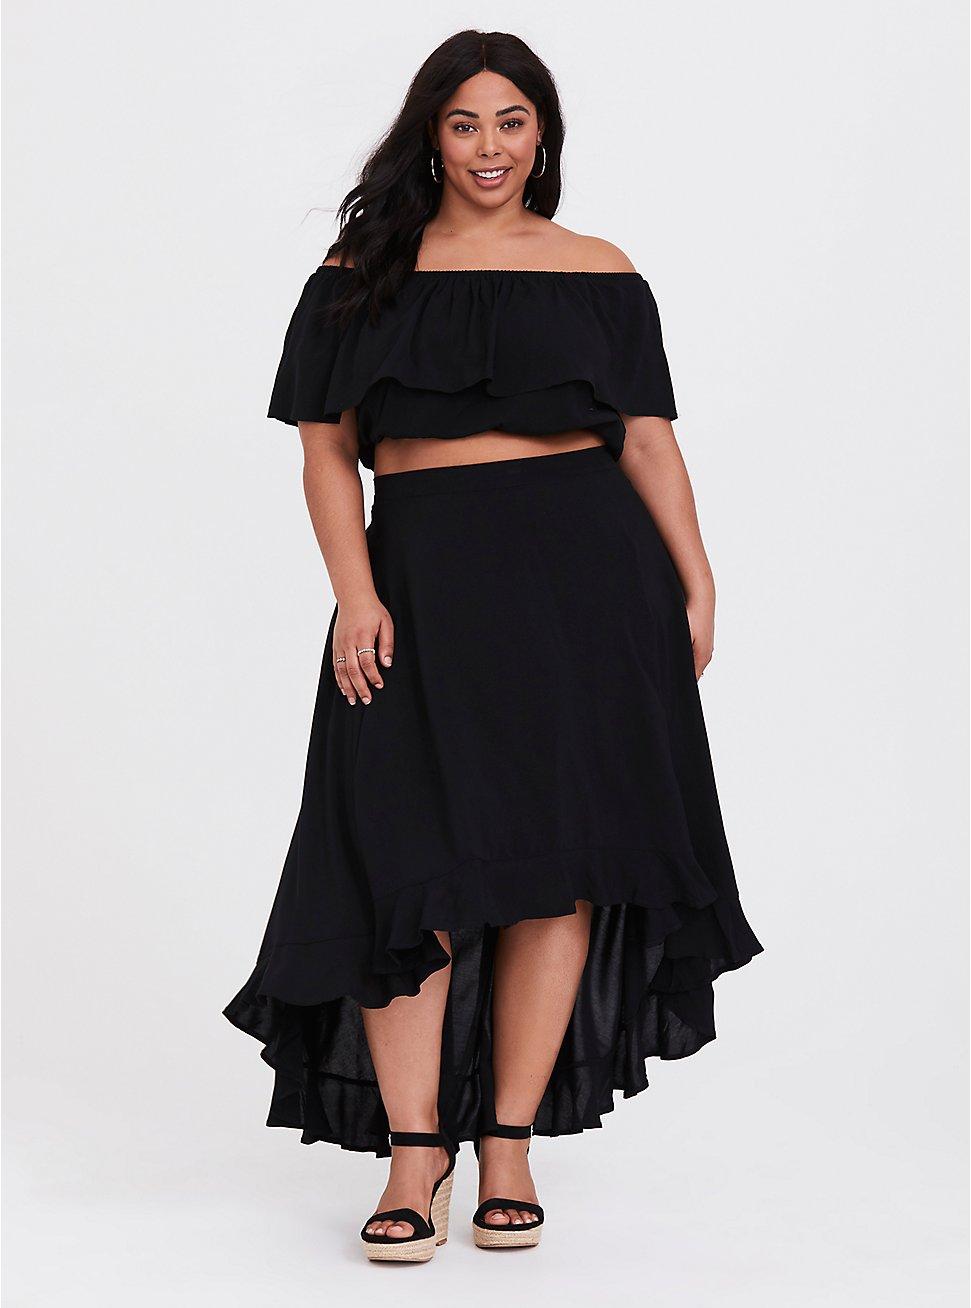 Black Challis Off Shoulder & Ruffle Skirt 2-Piece Set